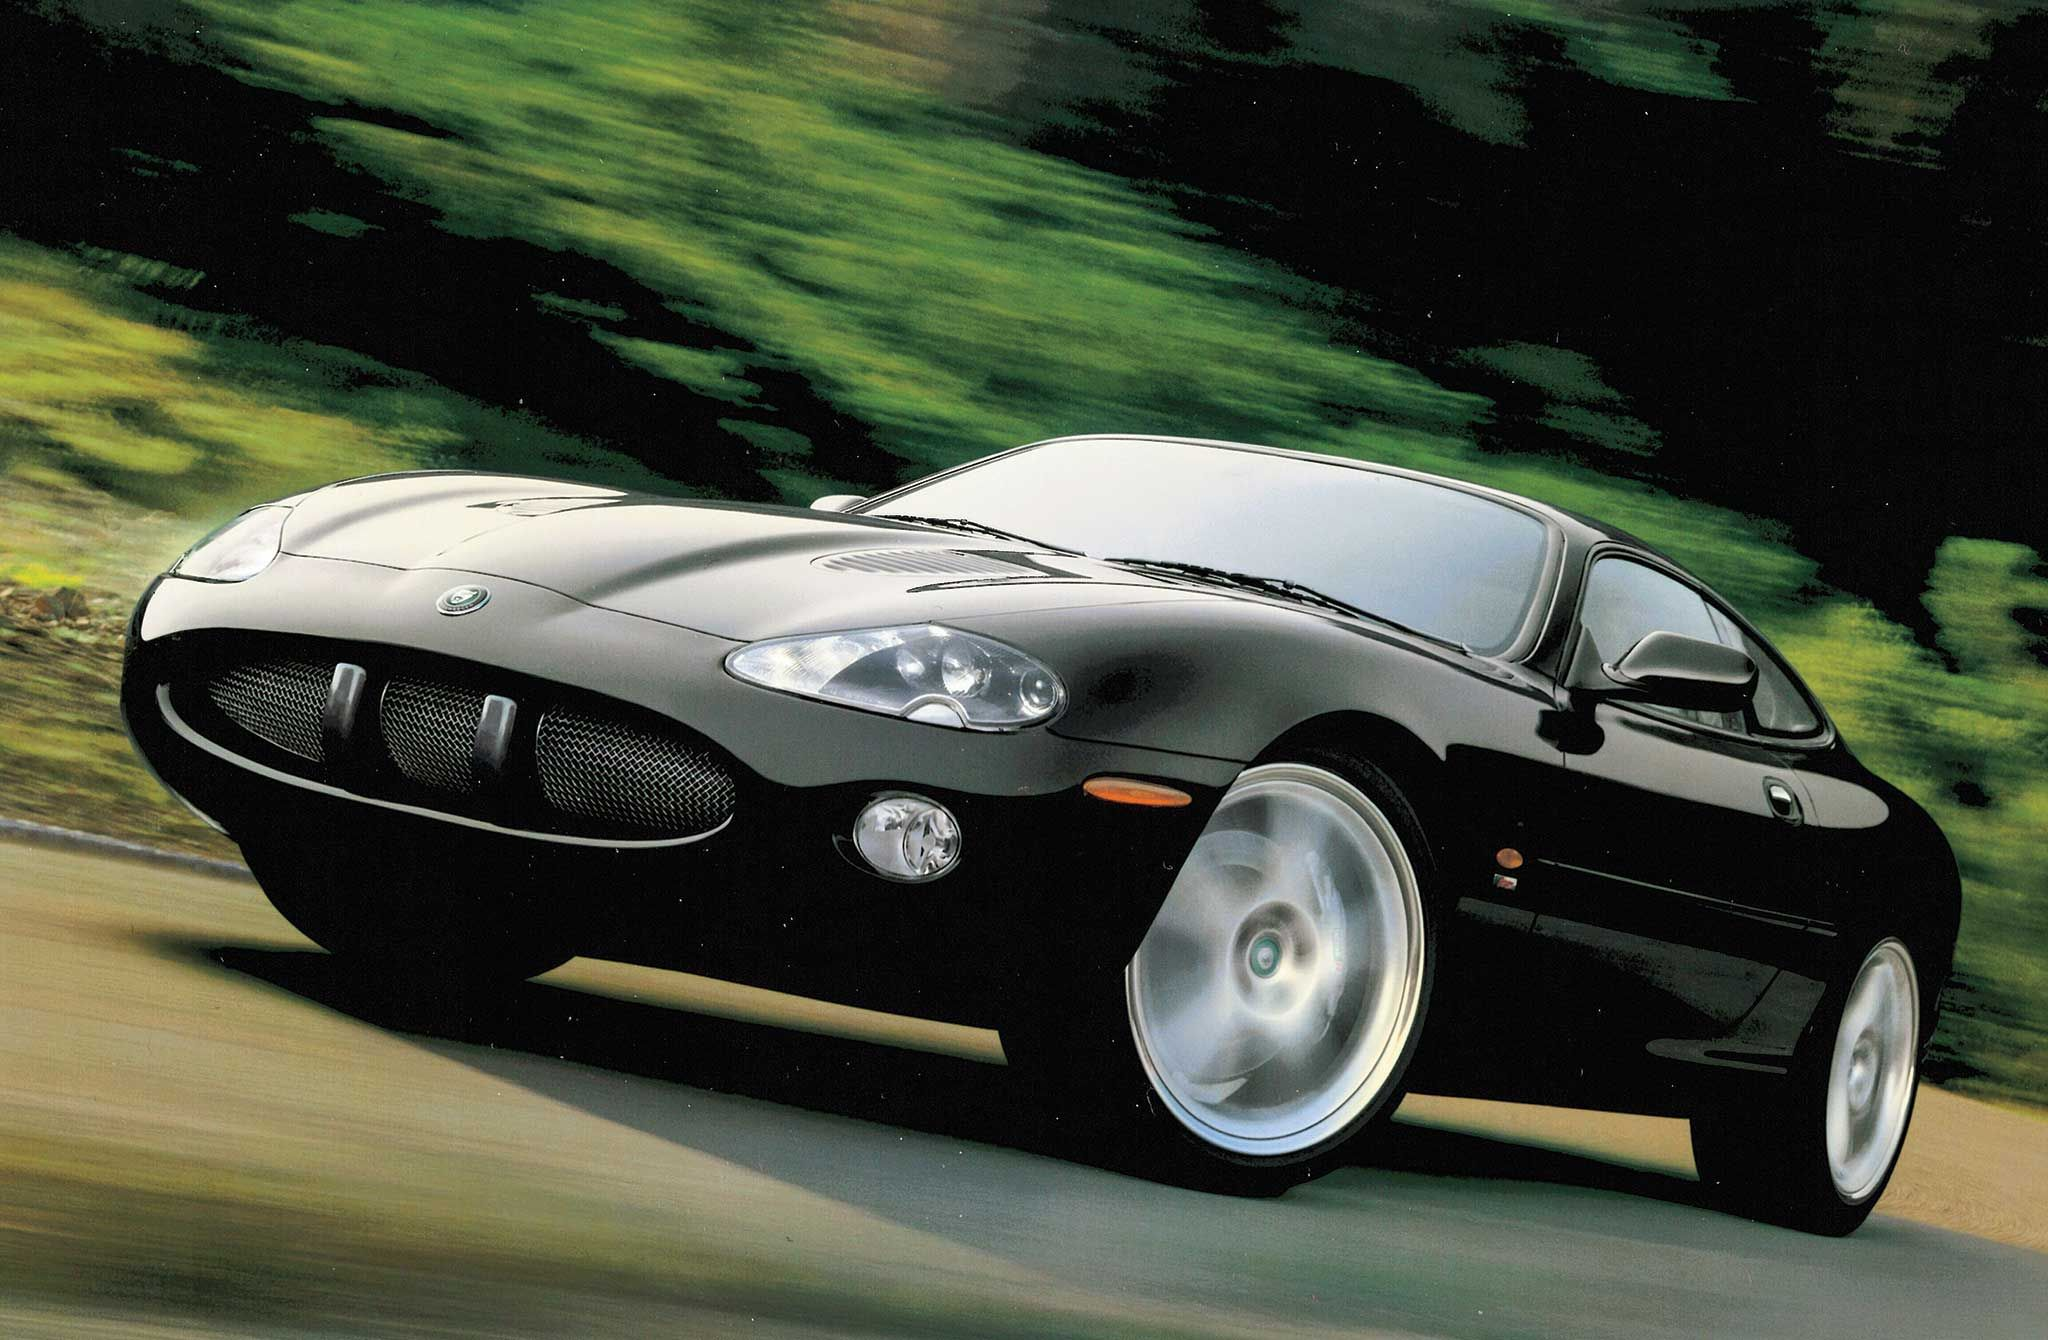 Jaguar XK (X100) - Dokonalé GT! | Auto Journal